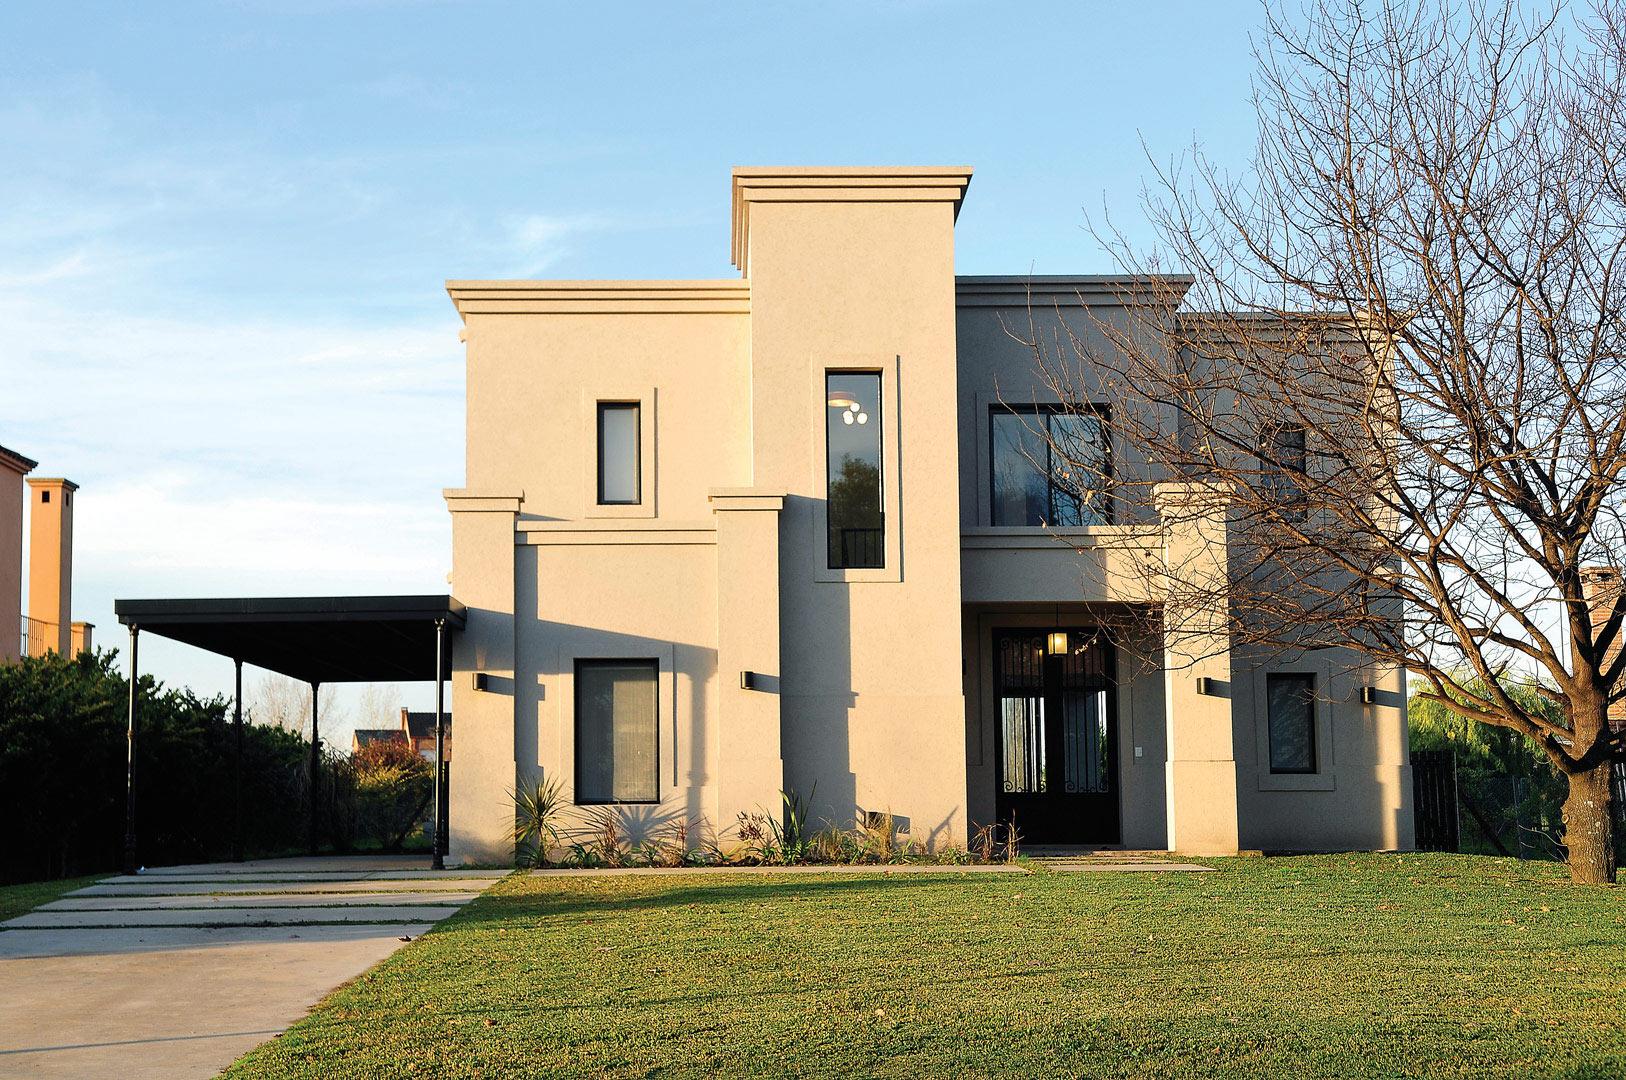 Arquitectos casas modernas de la de casas modernas casas con pedigr nueva bellas casas - Arquitectos casas modernas ...